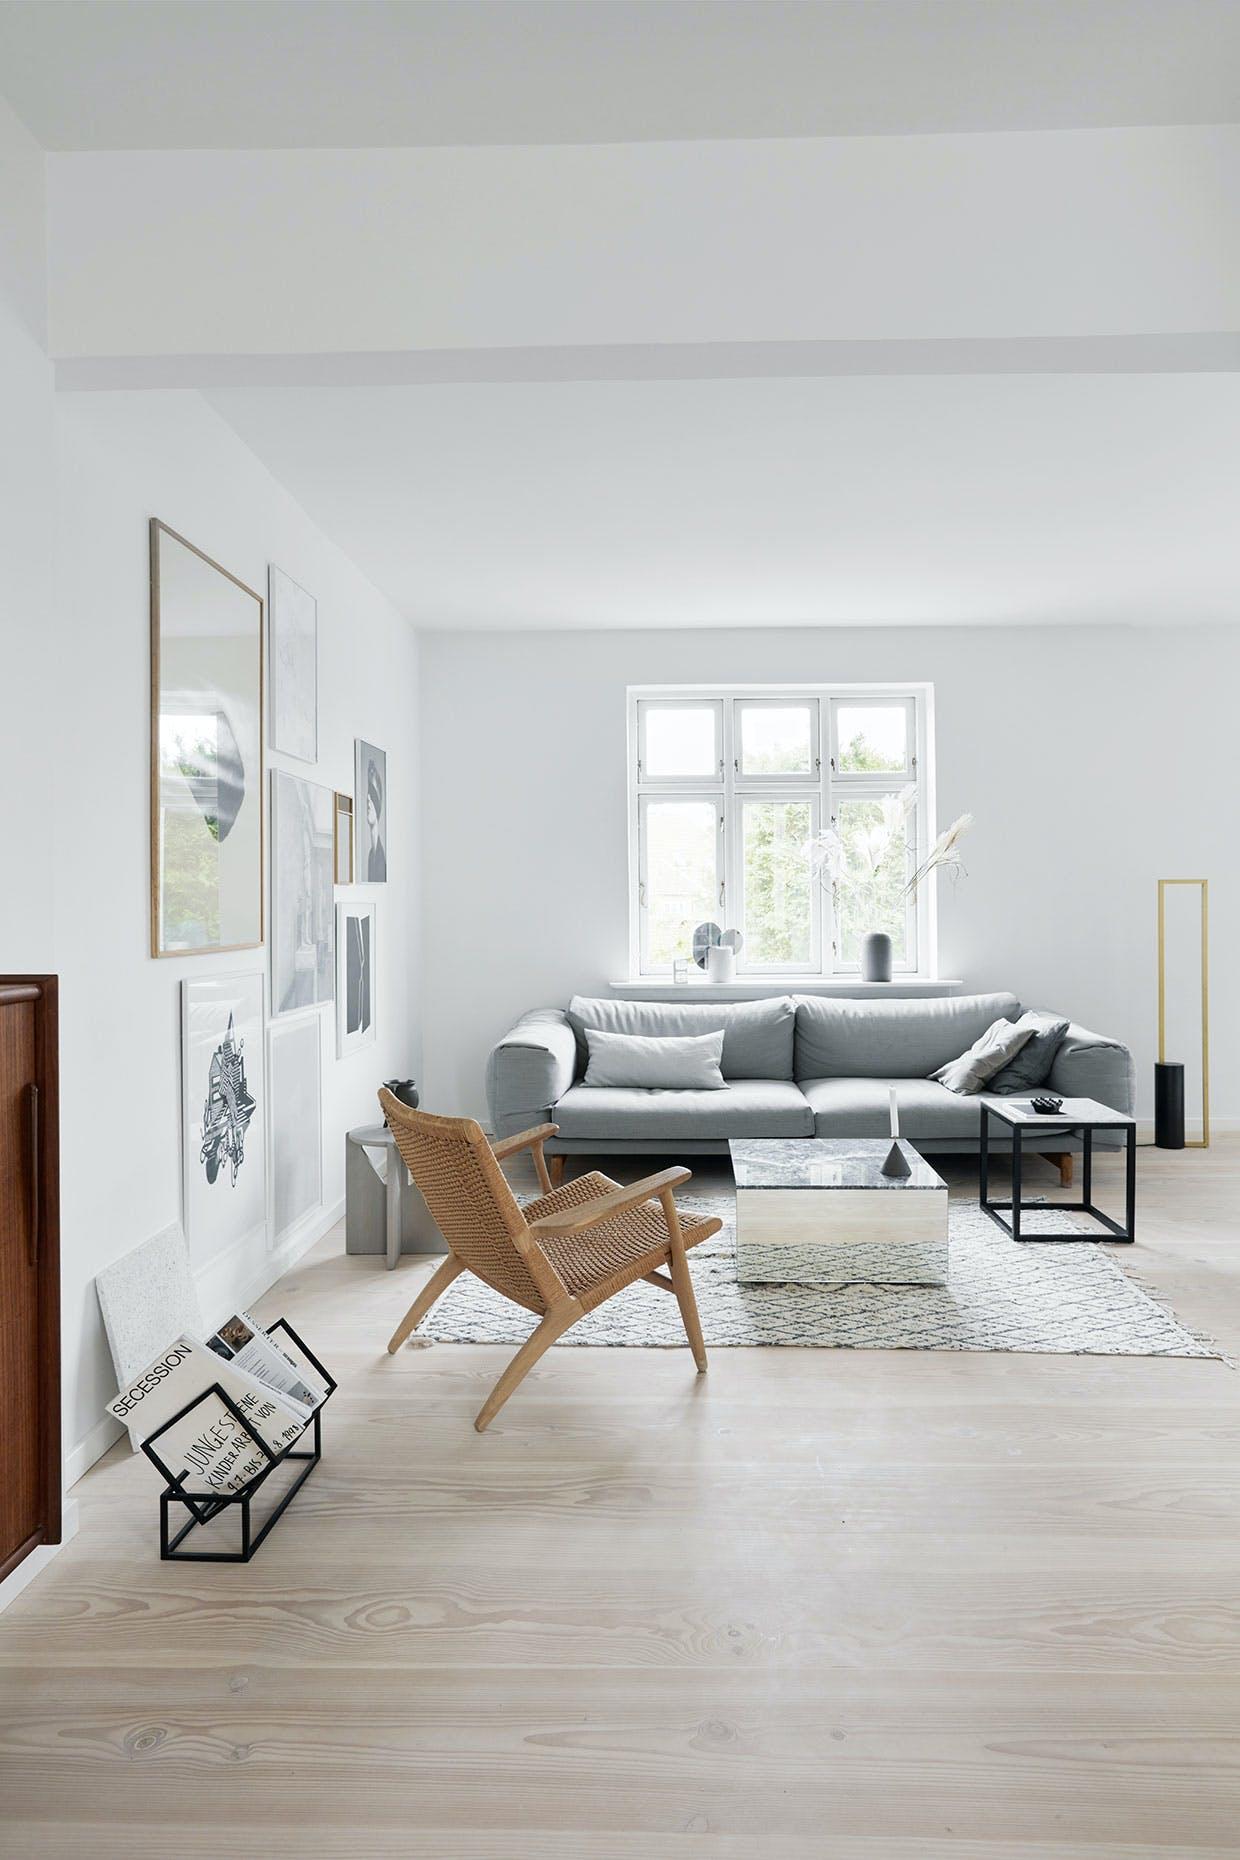 stue muuto sofa magasinholder kristina dam tæppe nordahl